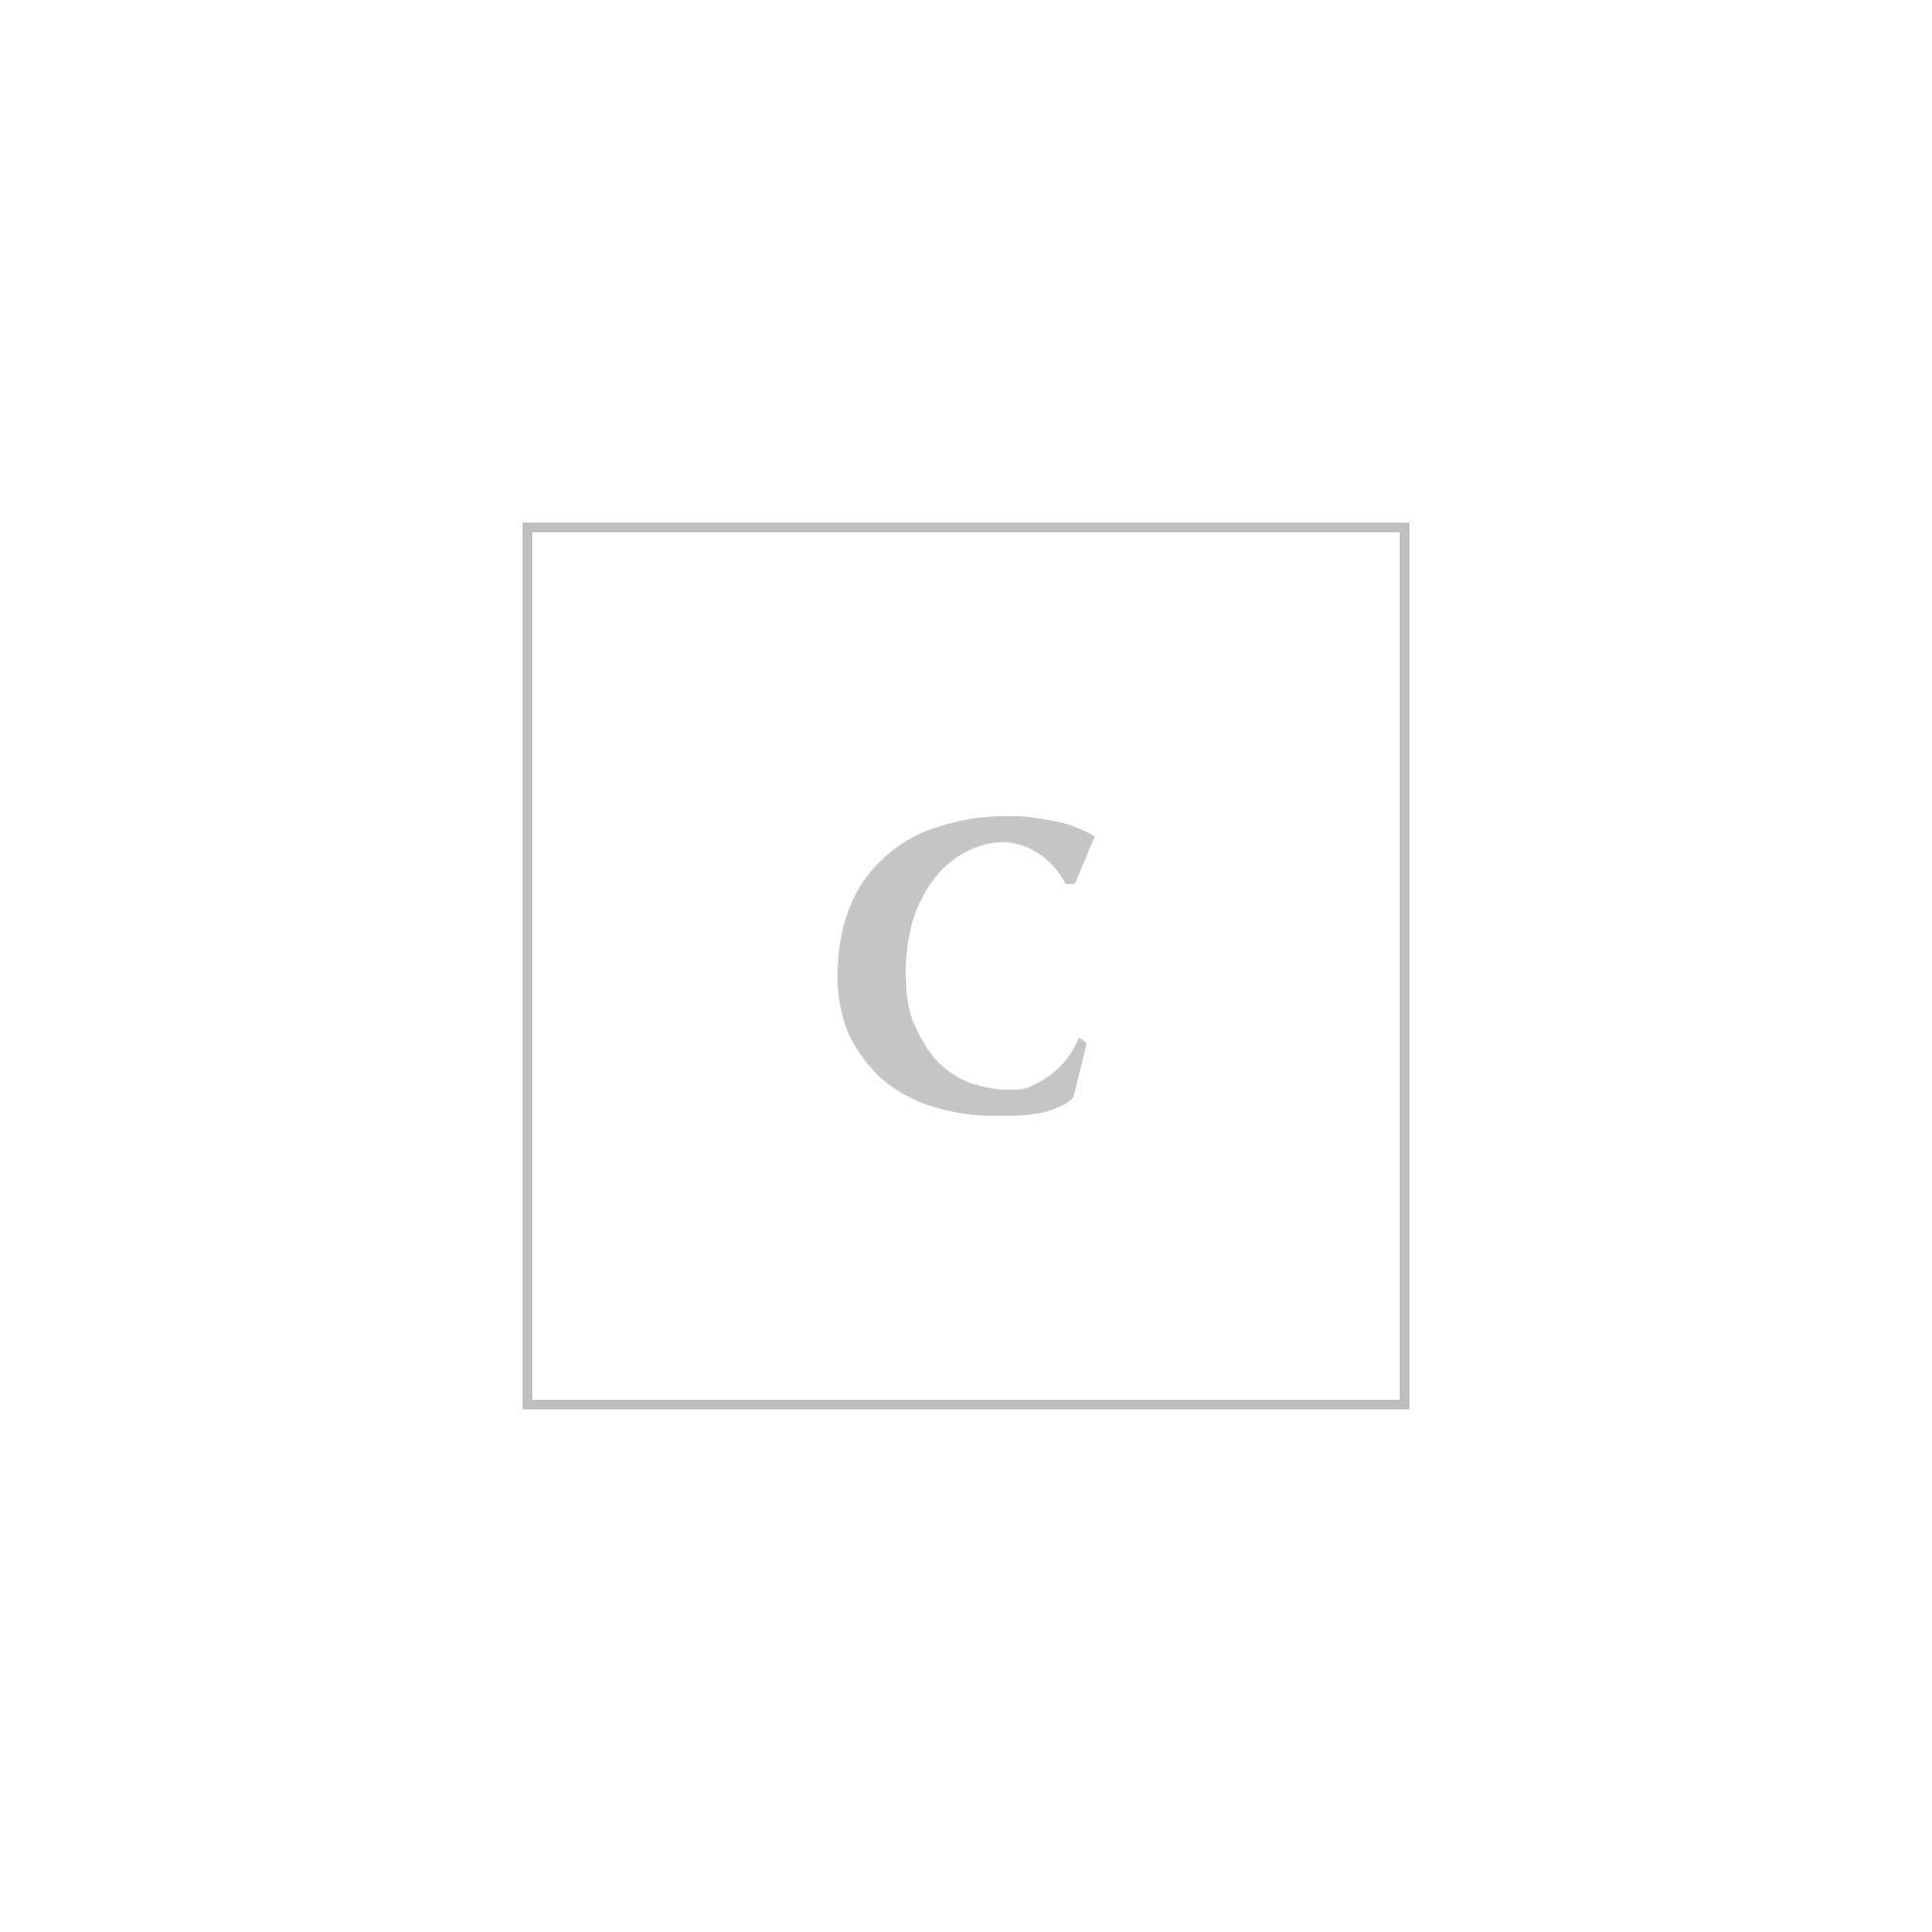 Missoni short-sleeved turtleneck